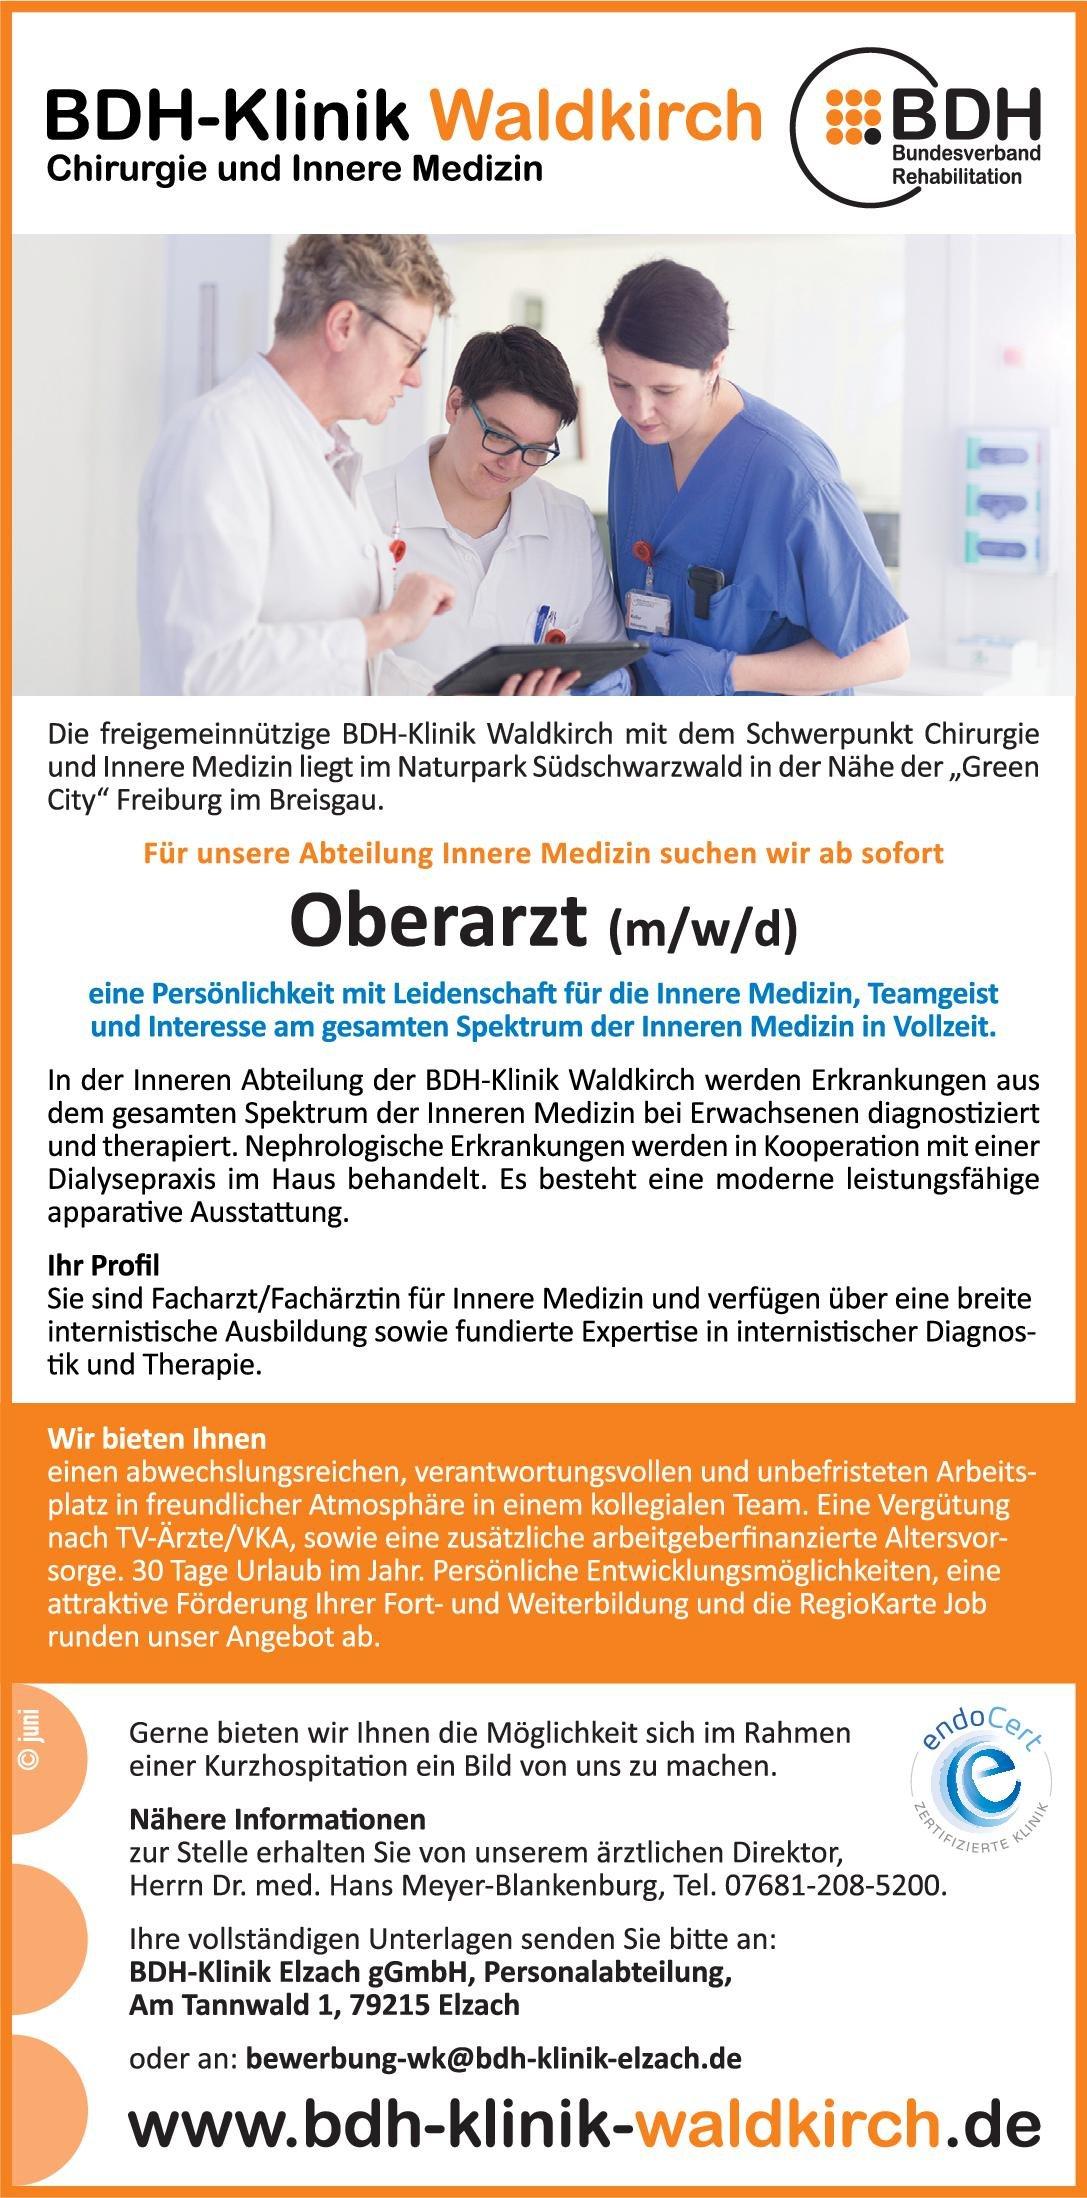 BDH-Klinik Waldkirch Oberarzt (m/w/d) Innere Medizin  Innere Medizin, Innere Medizin Oberarzt